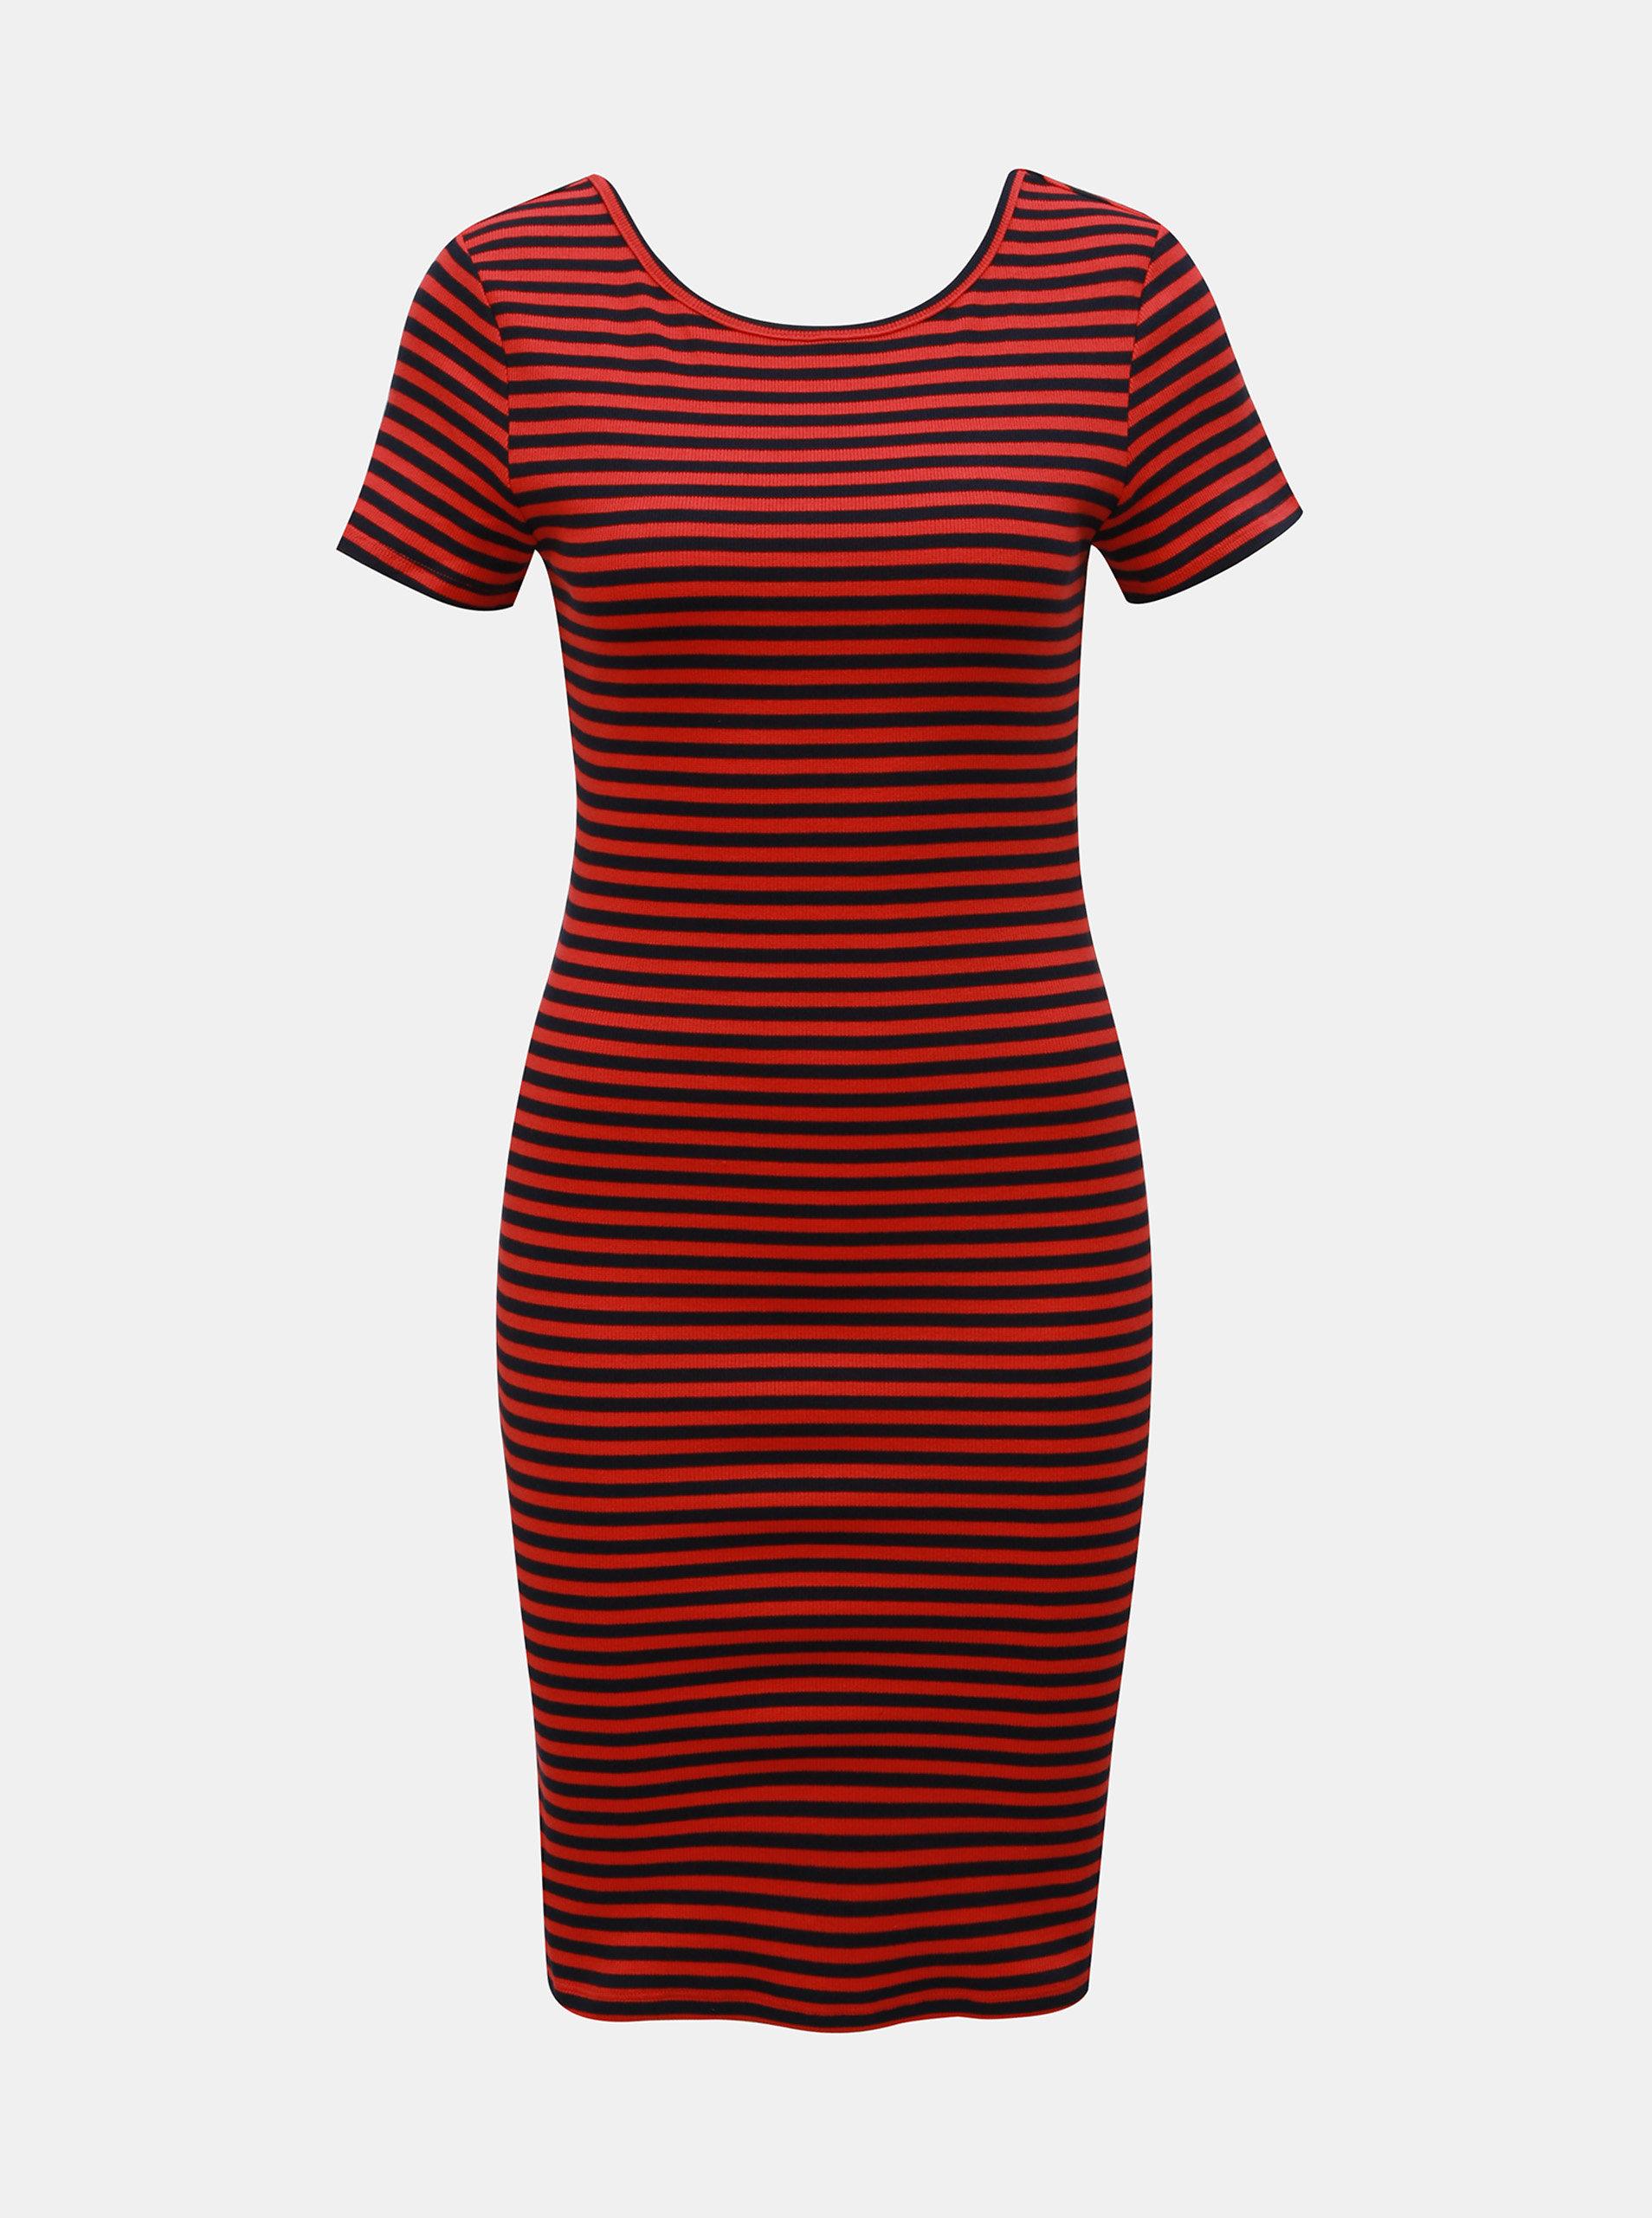 7a34e90a77e7 Modro–červené pruhované puzdrové šaty ONLY Bella ...